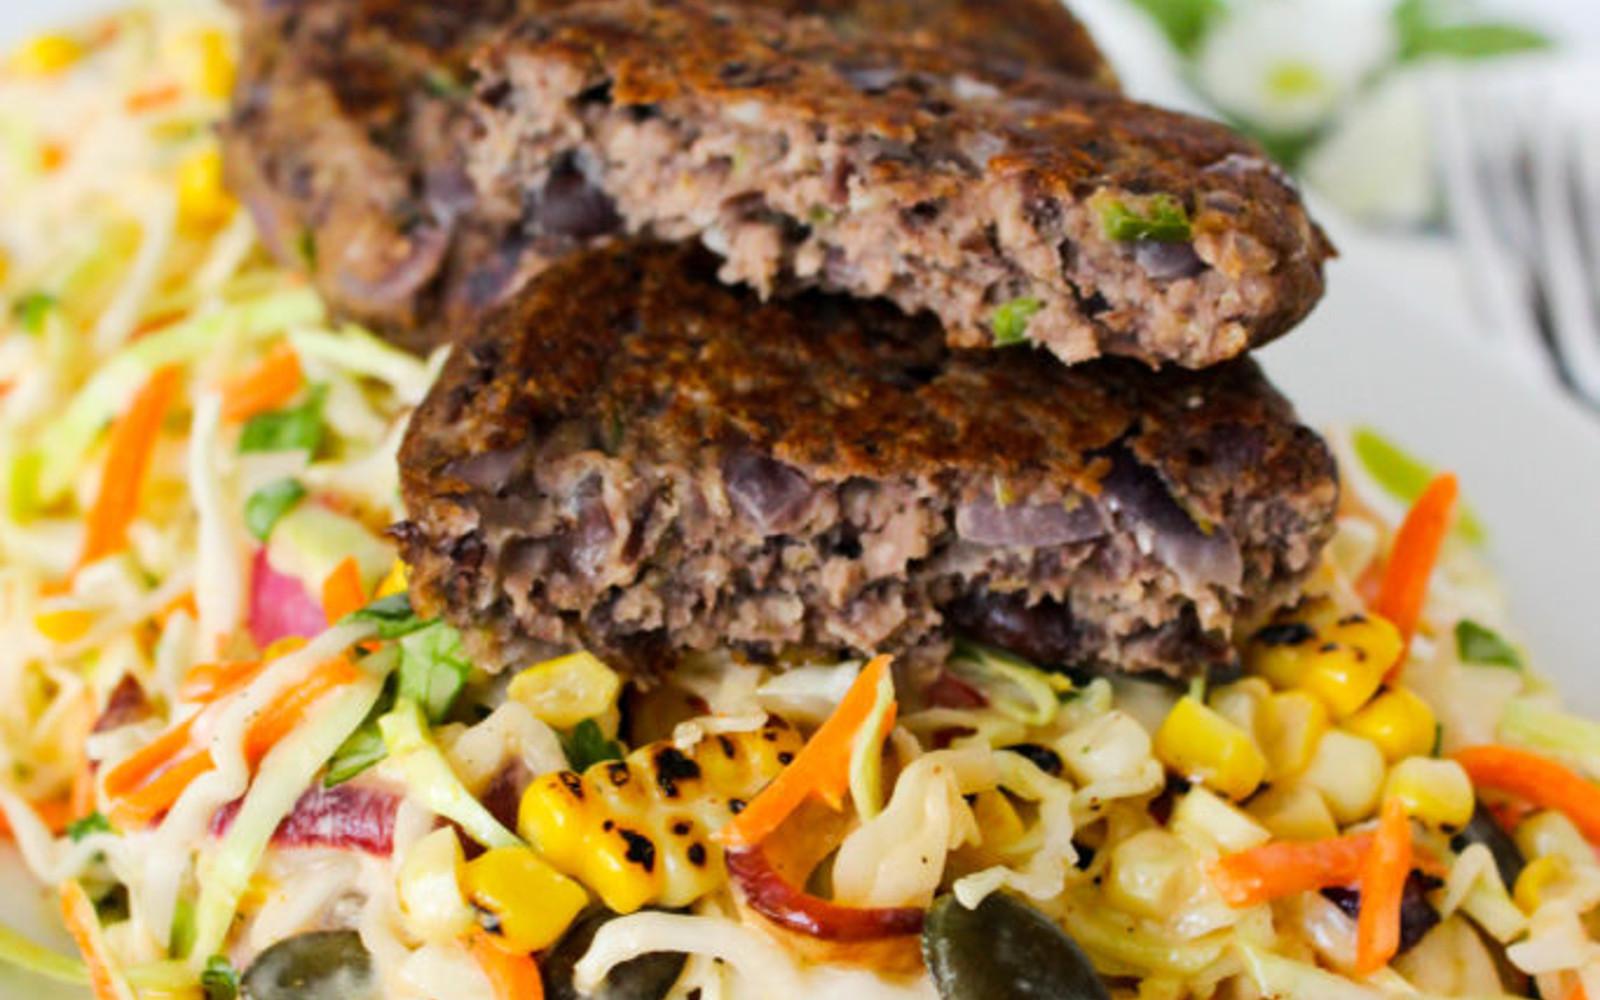 Gluten-FreeVegan Jalapeño Black Bean Patties with Mexican Coleslaw cut open